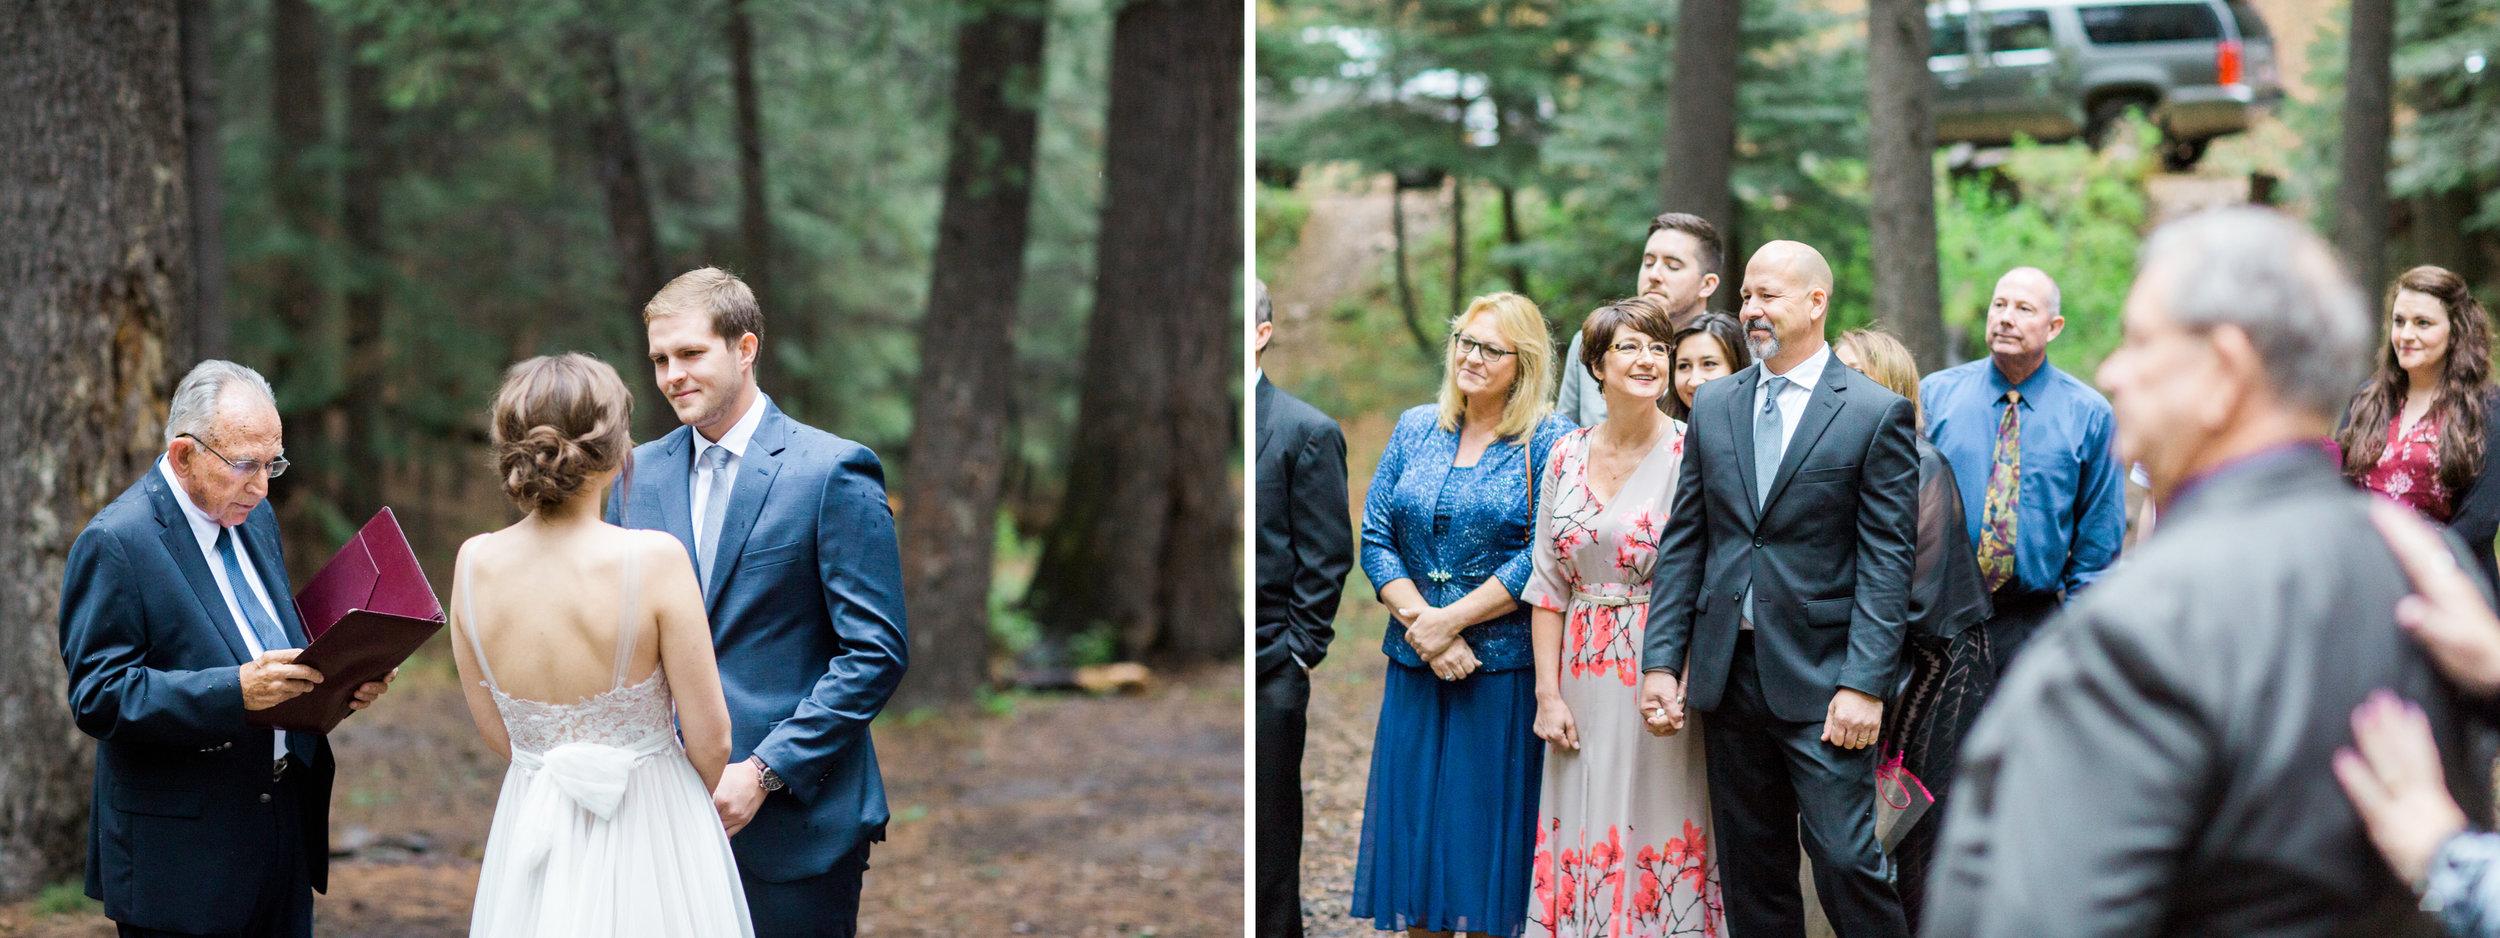 Our Wedding Post_054.JPG